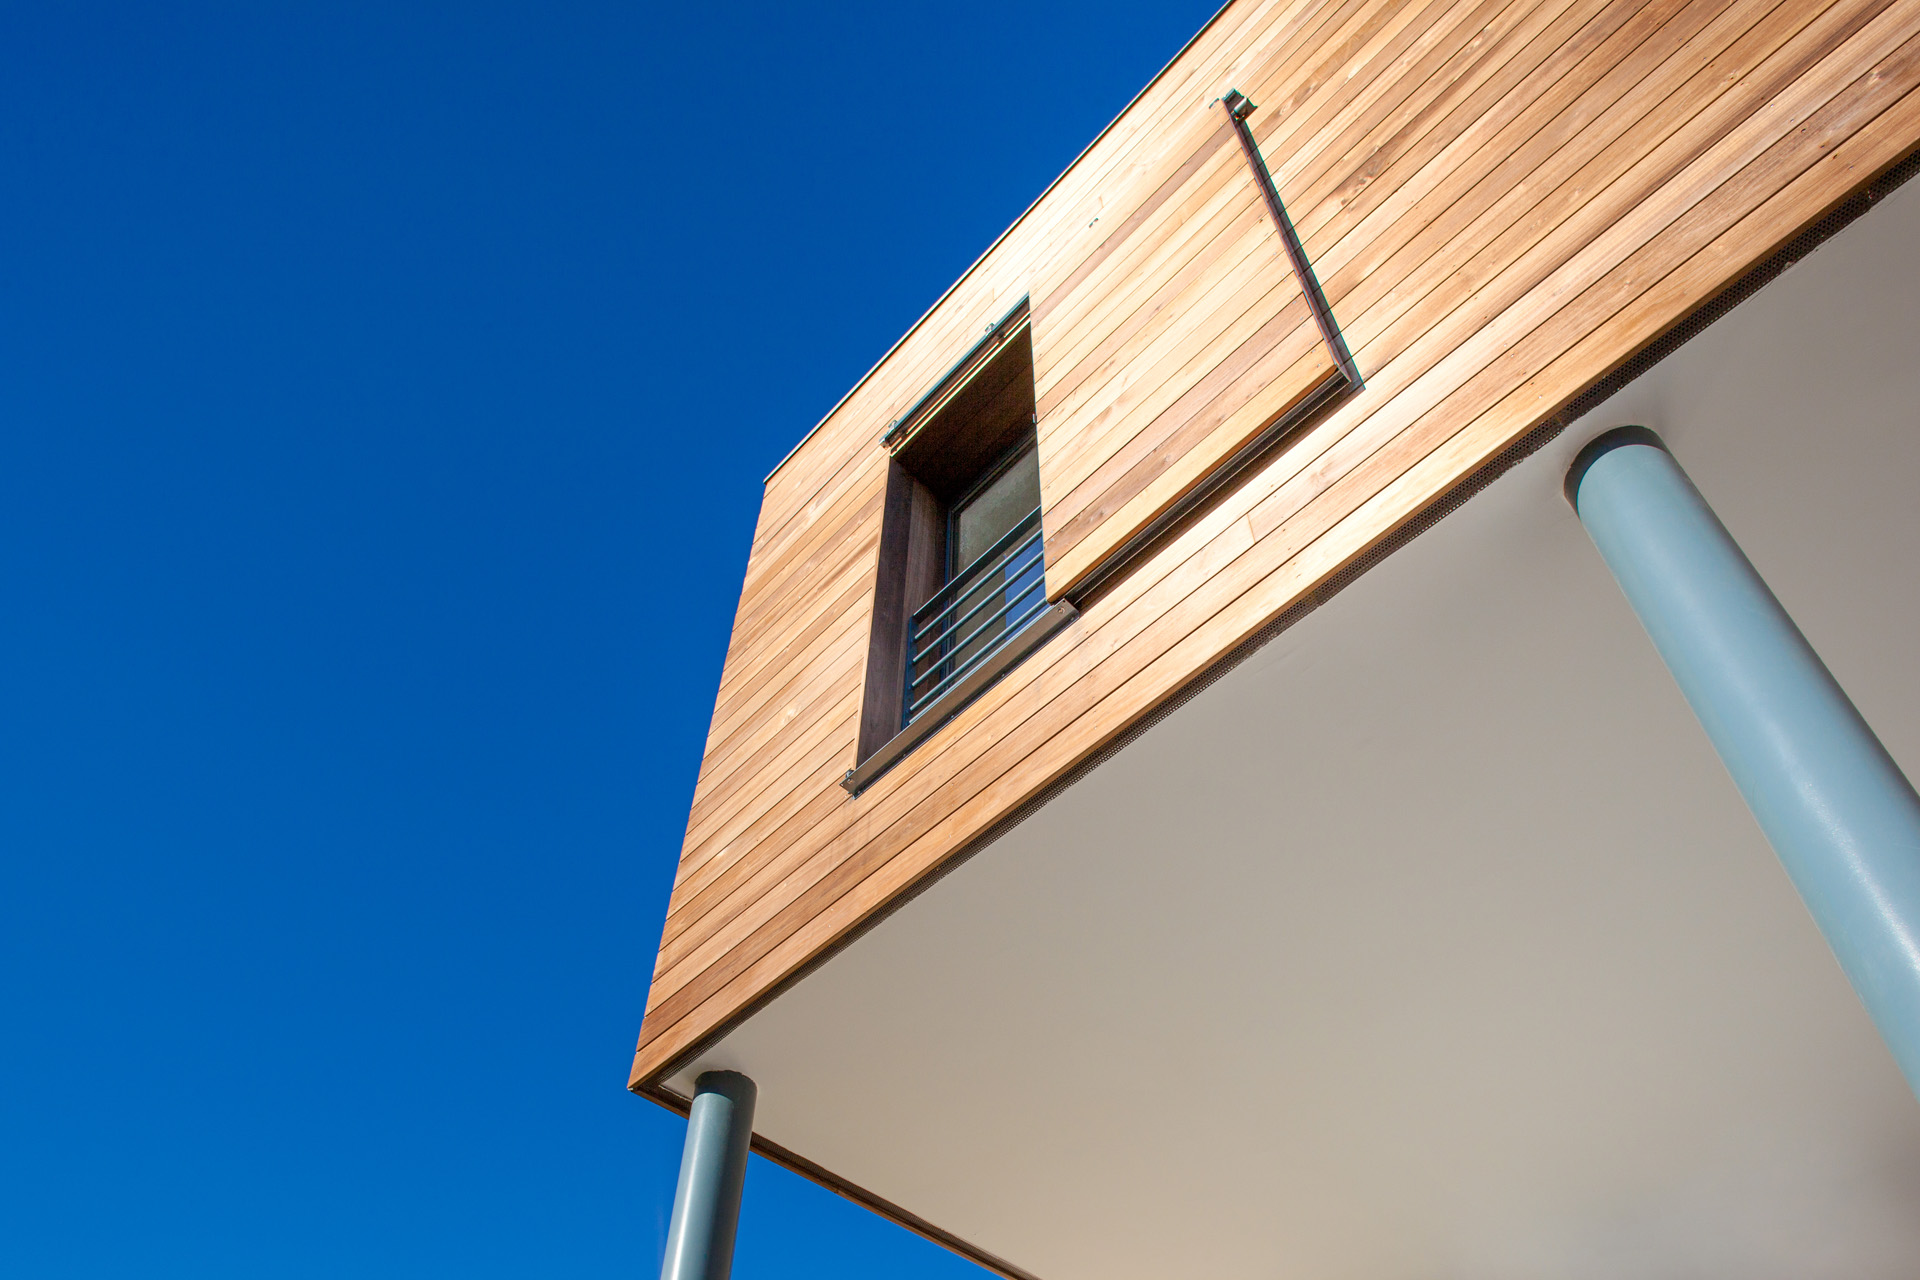 maison b lhenry architecture. Black Bedroom Furniture Sets. Home Design Ideas